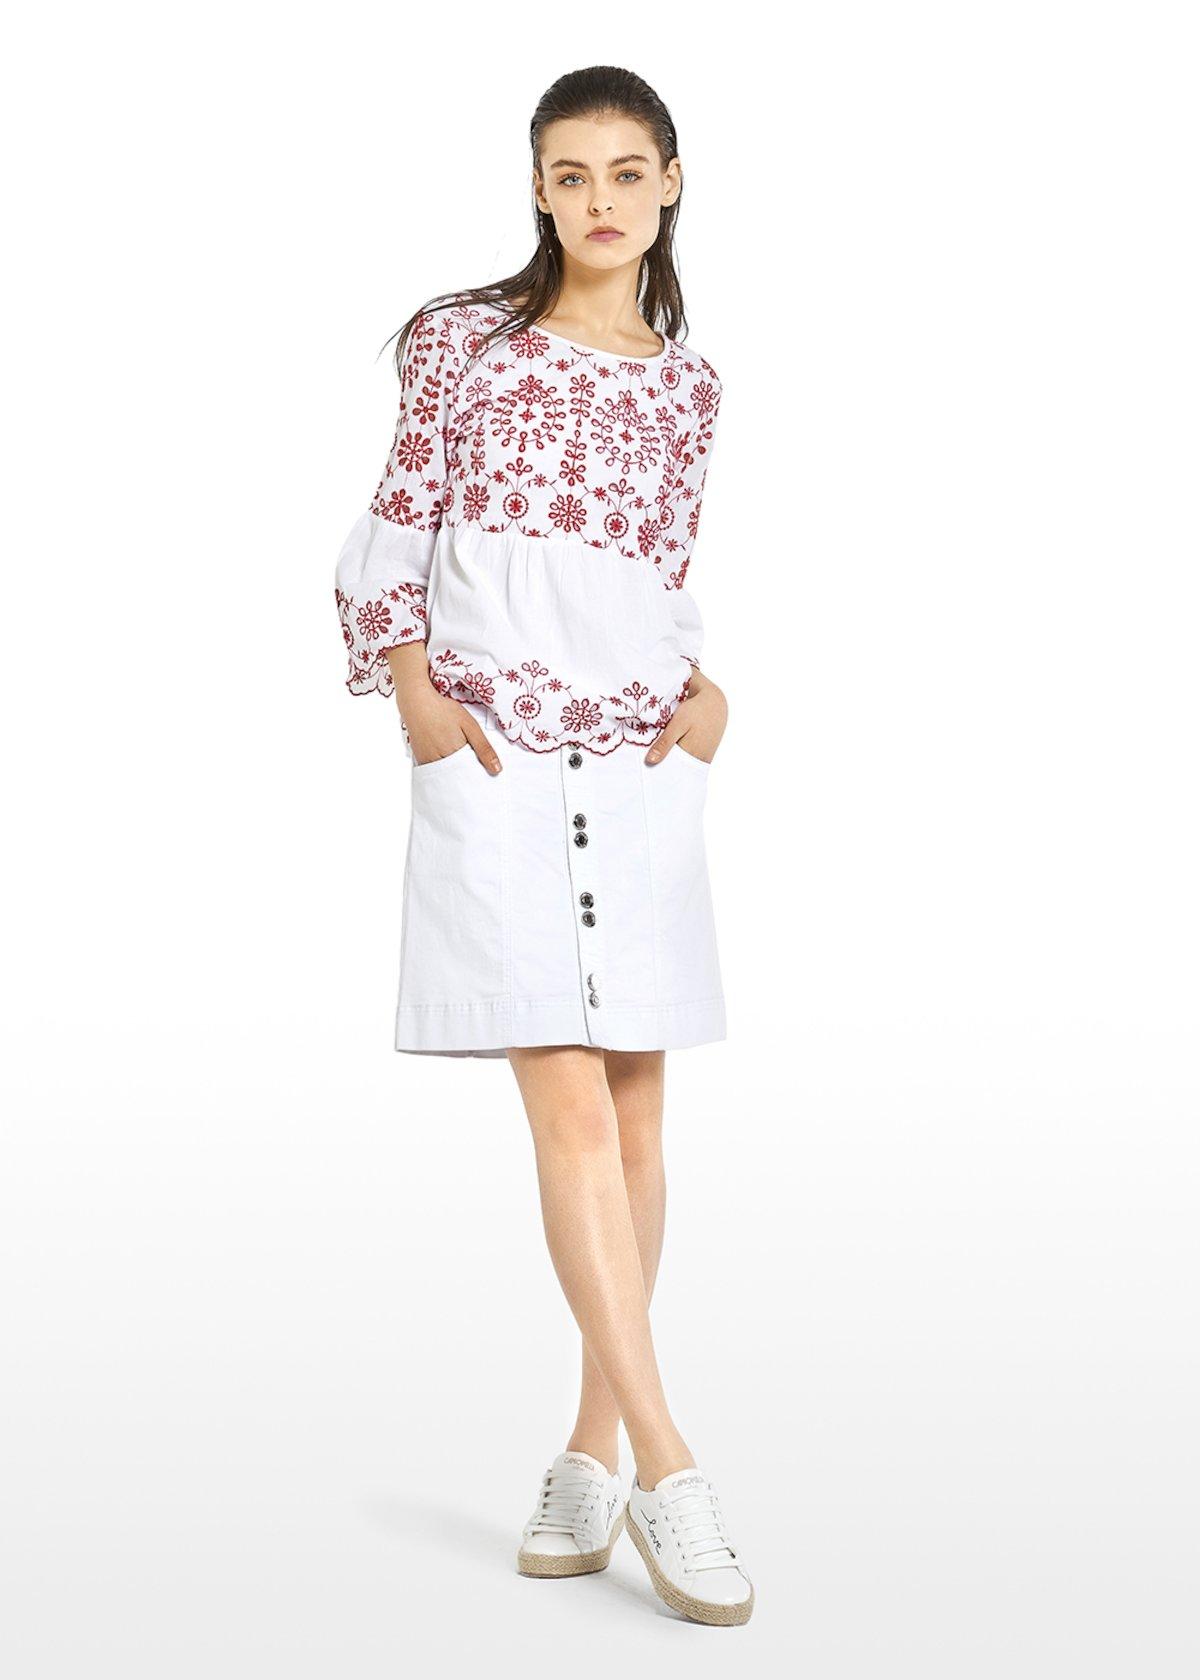 Cagy blouse with flounce - White / Tulipano Fantasia - Woman